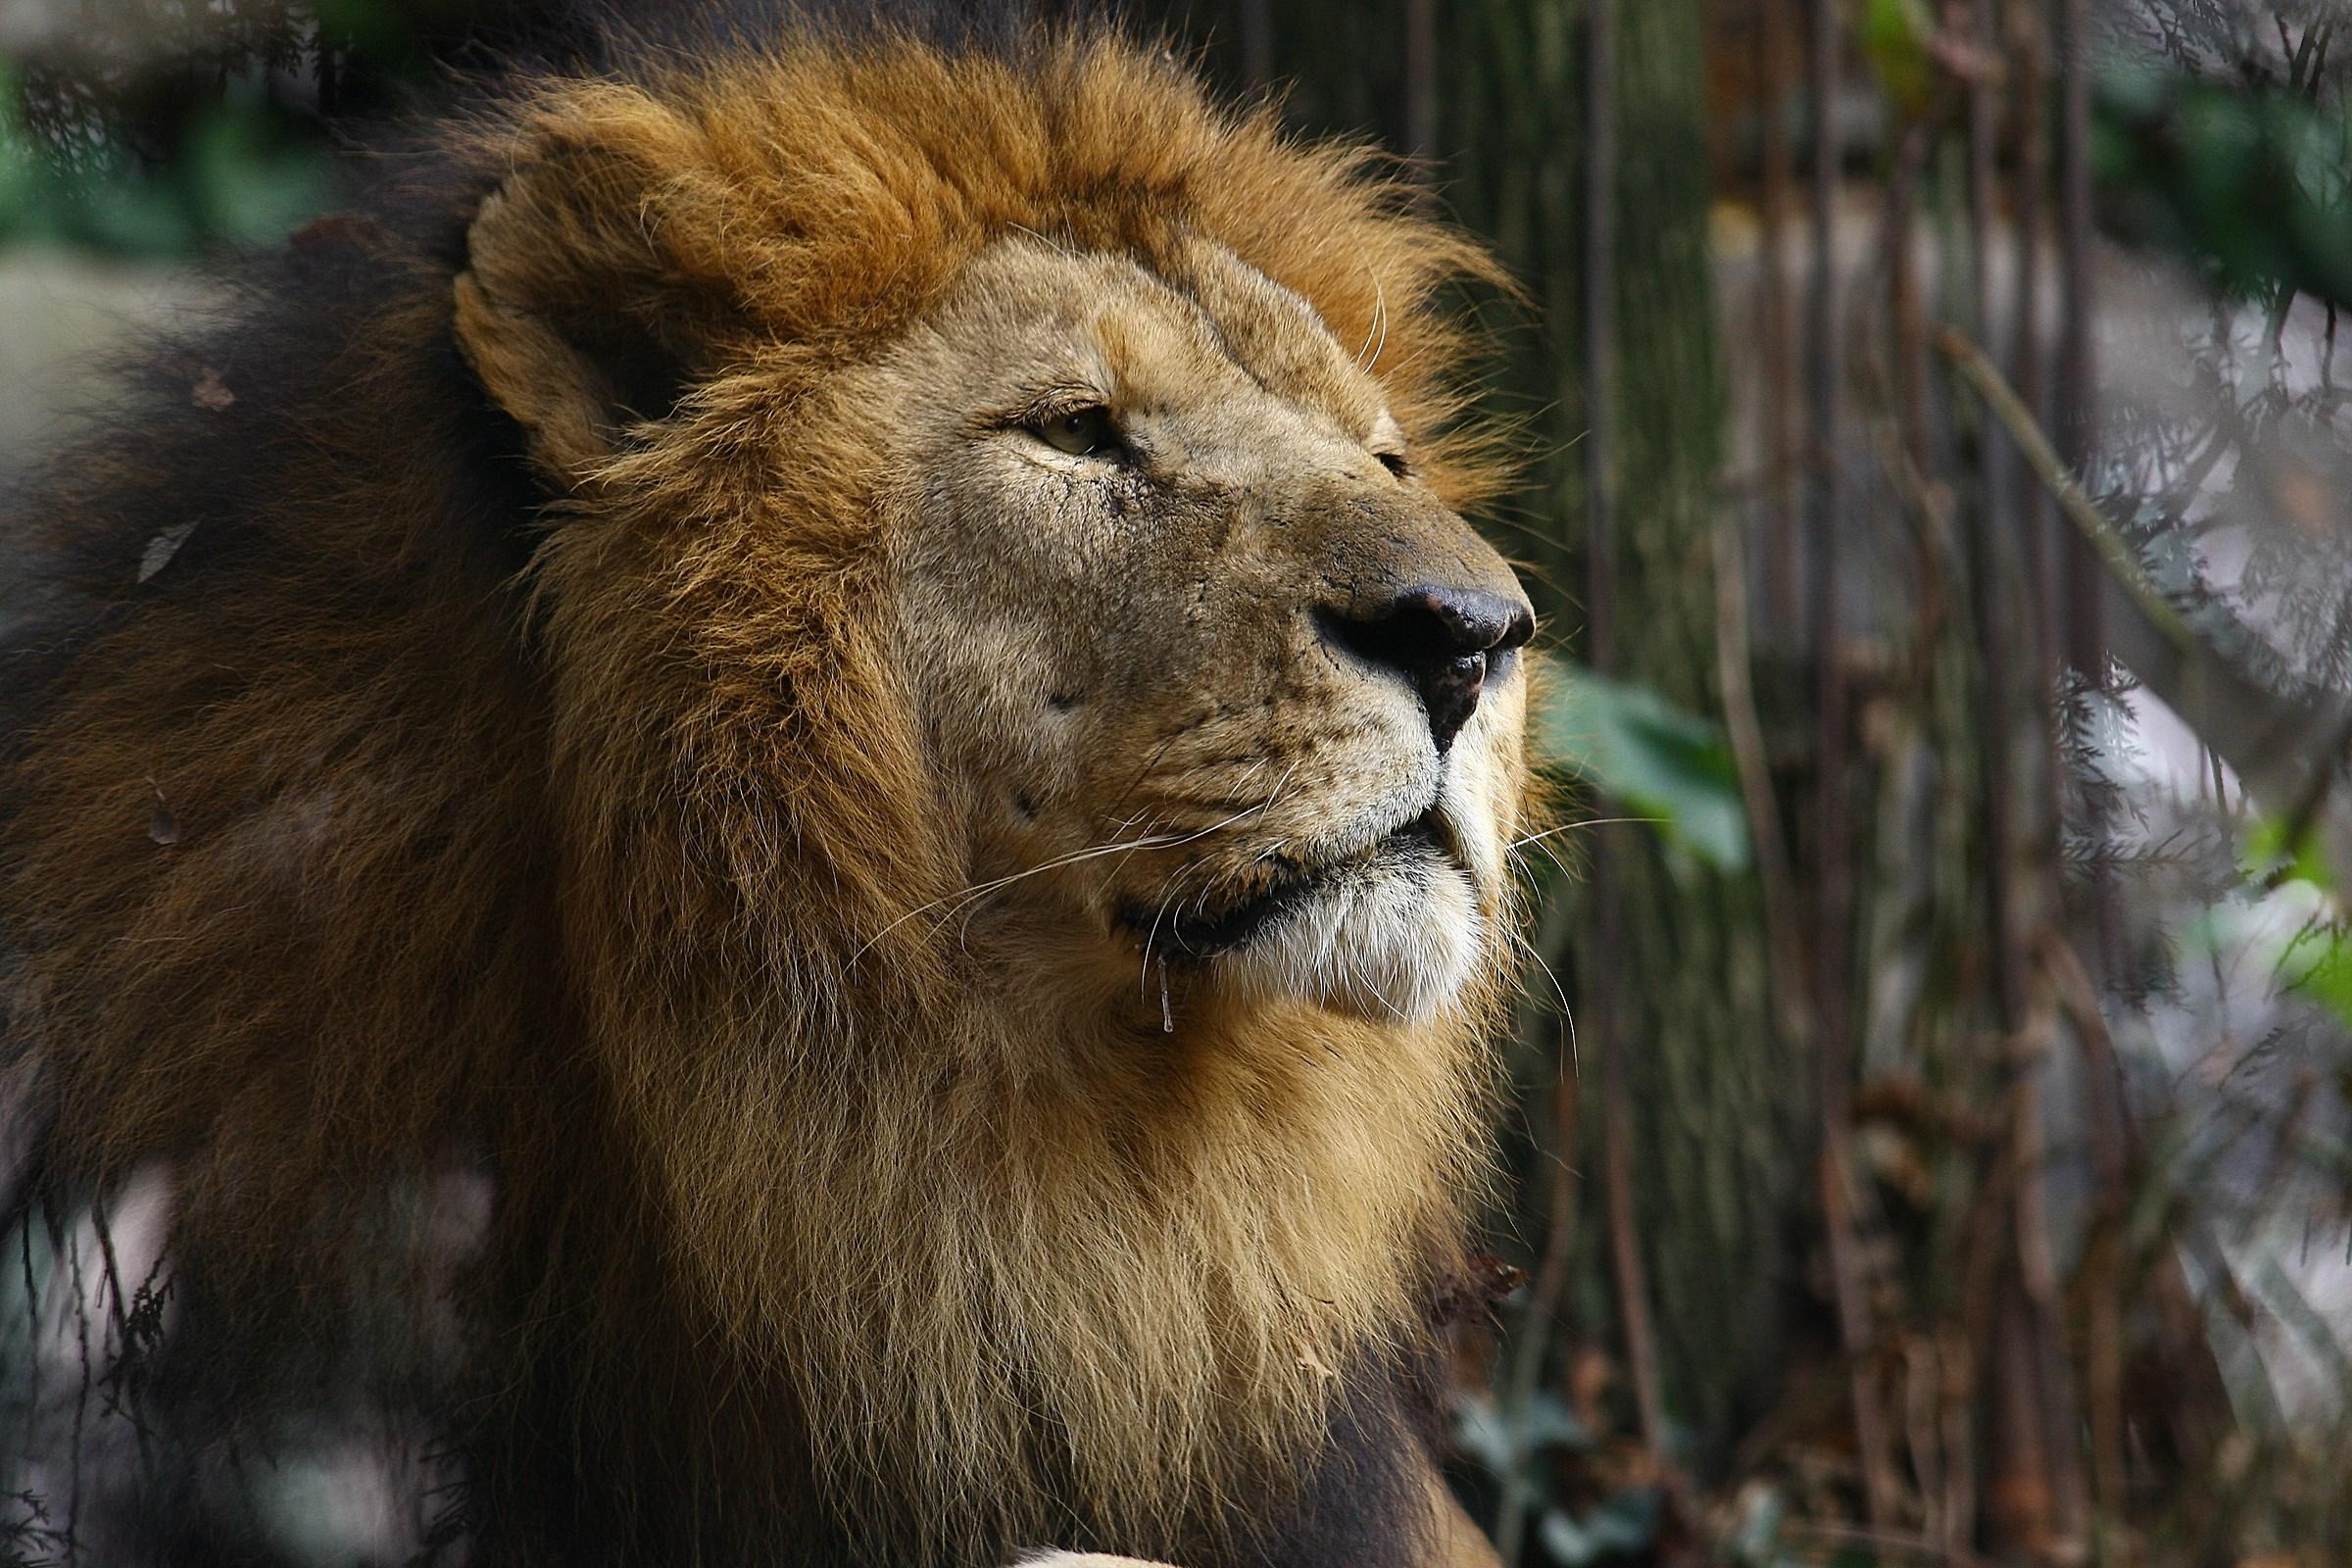 the king's gaze .....